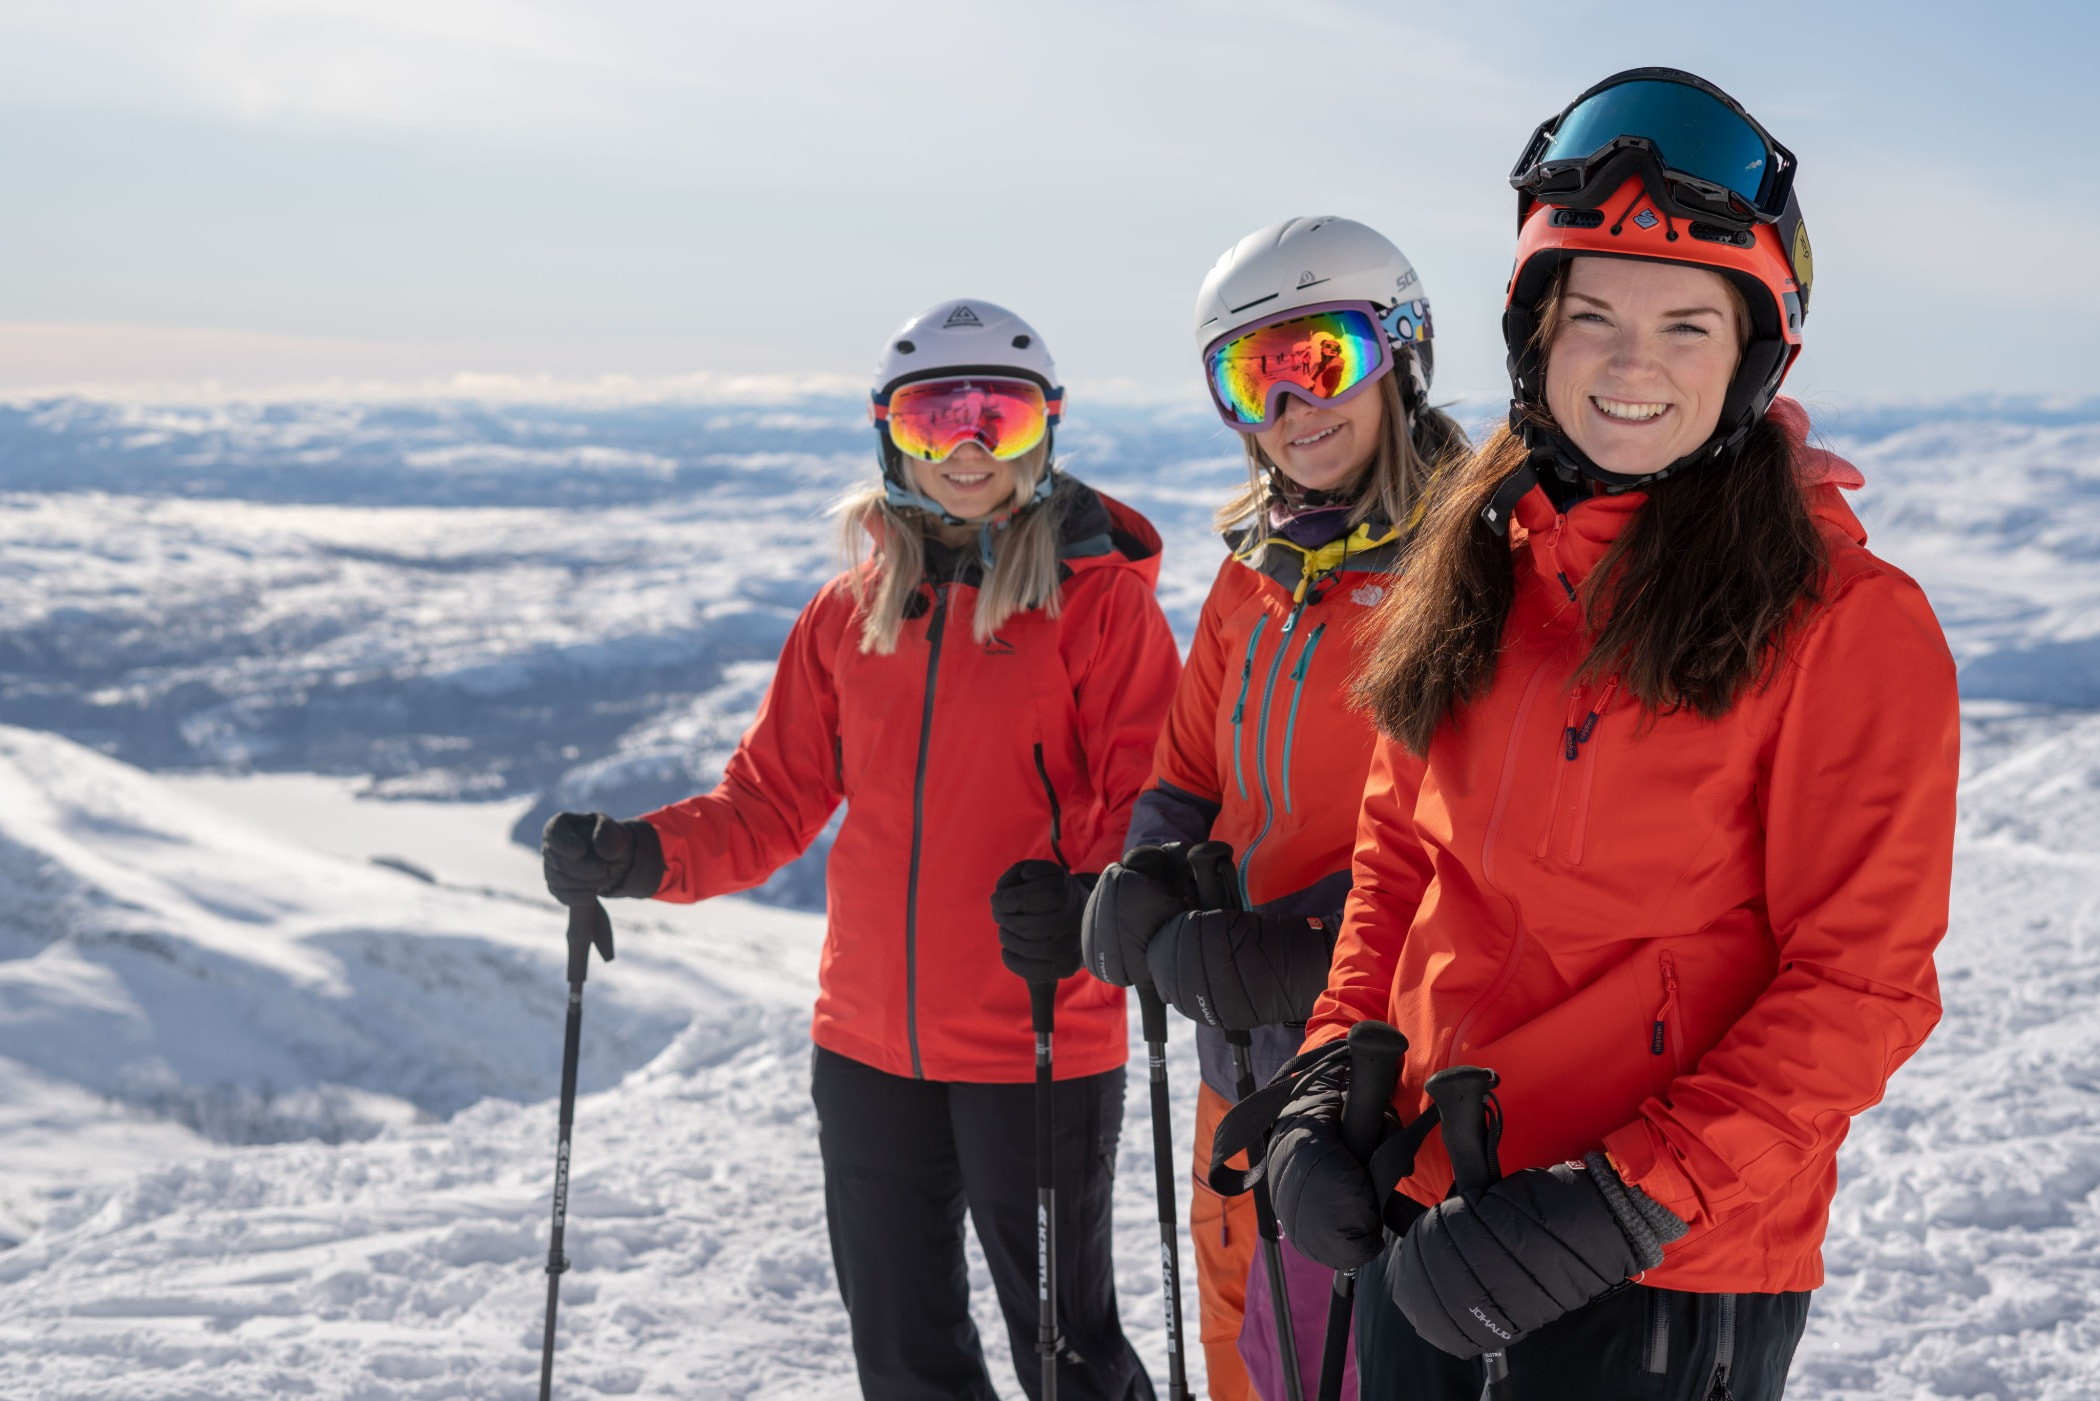 Outdoor recreation, Ski mountaineering, Skiing, Helmet, Winter, Snow